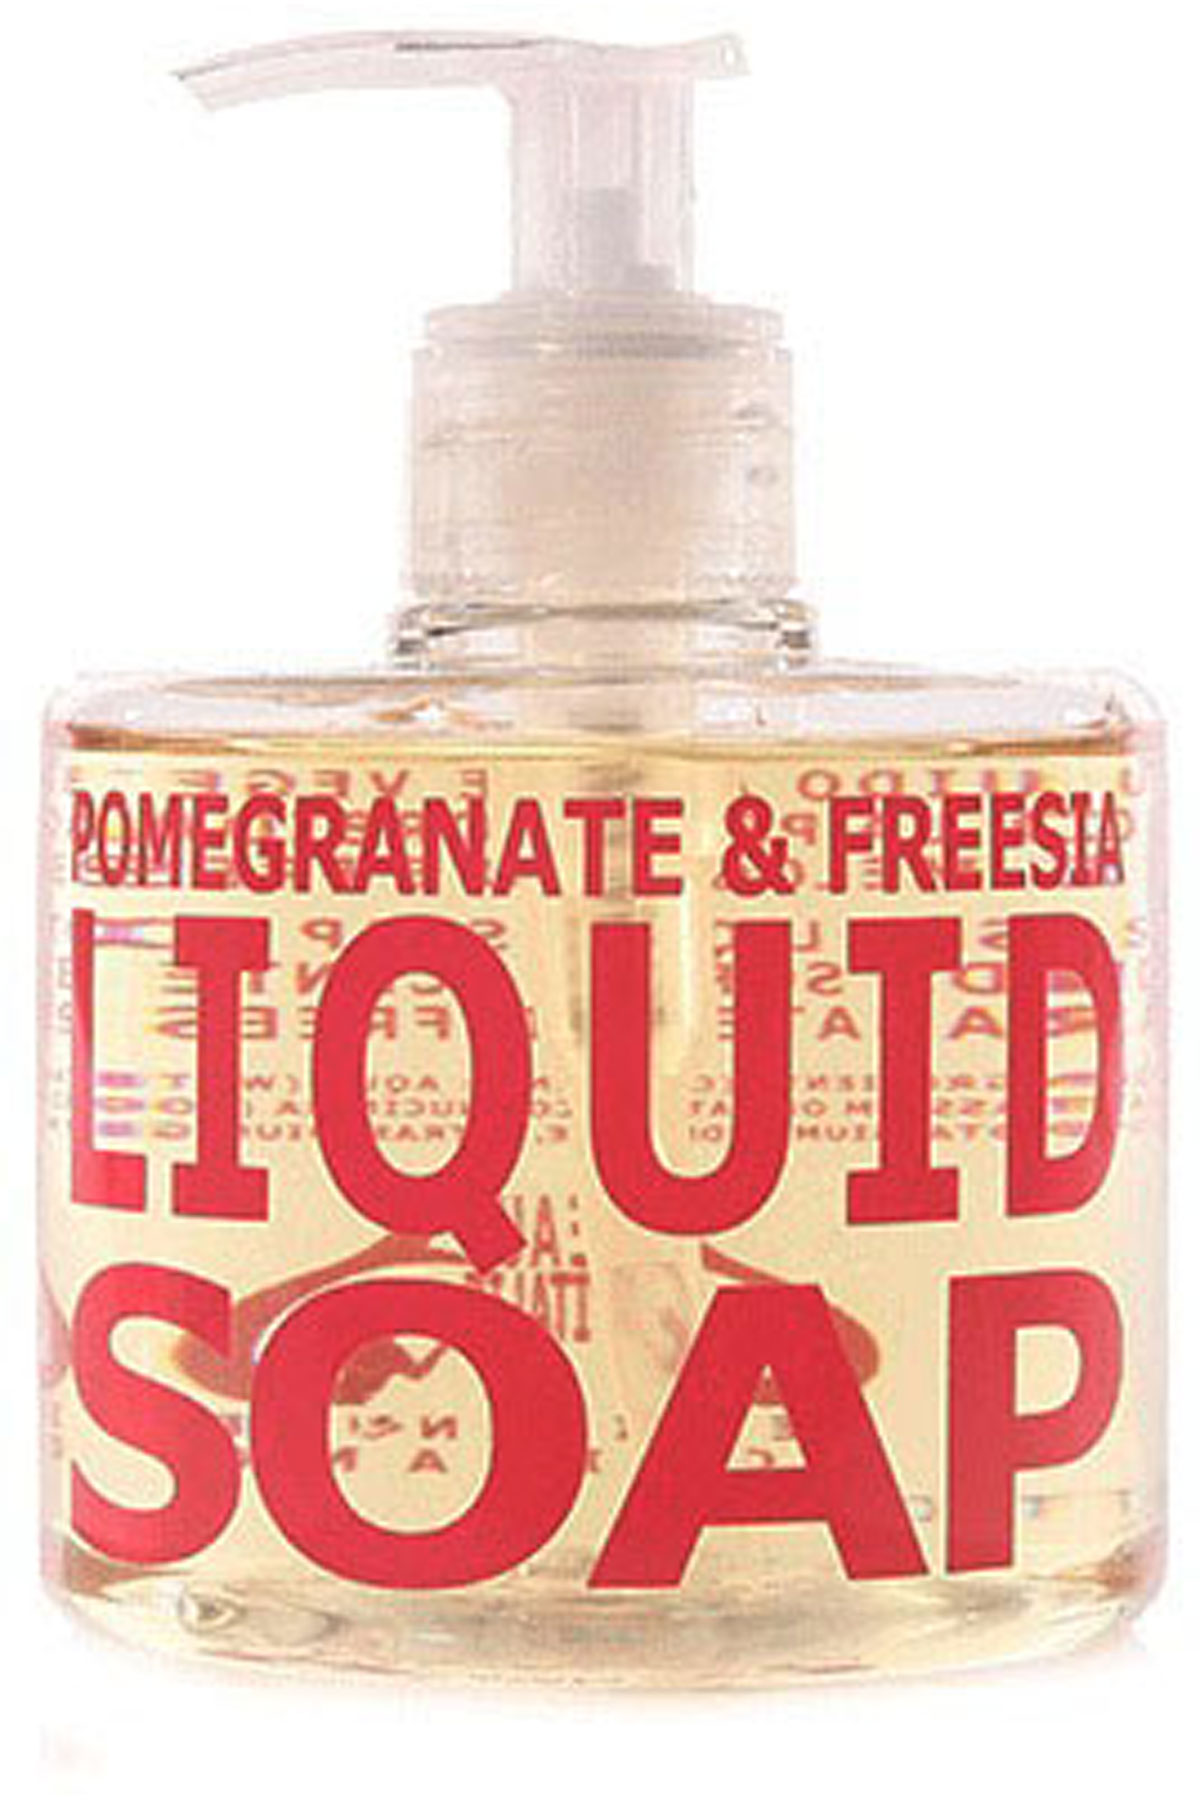 Eau D Italie Beauty for Men, Pomegranate And Freesia - Liquid Soap - 300 Ml, 2019, 300 ml